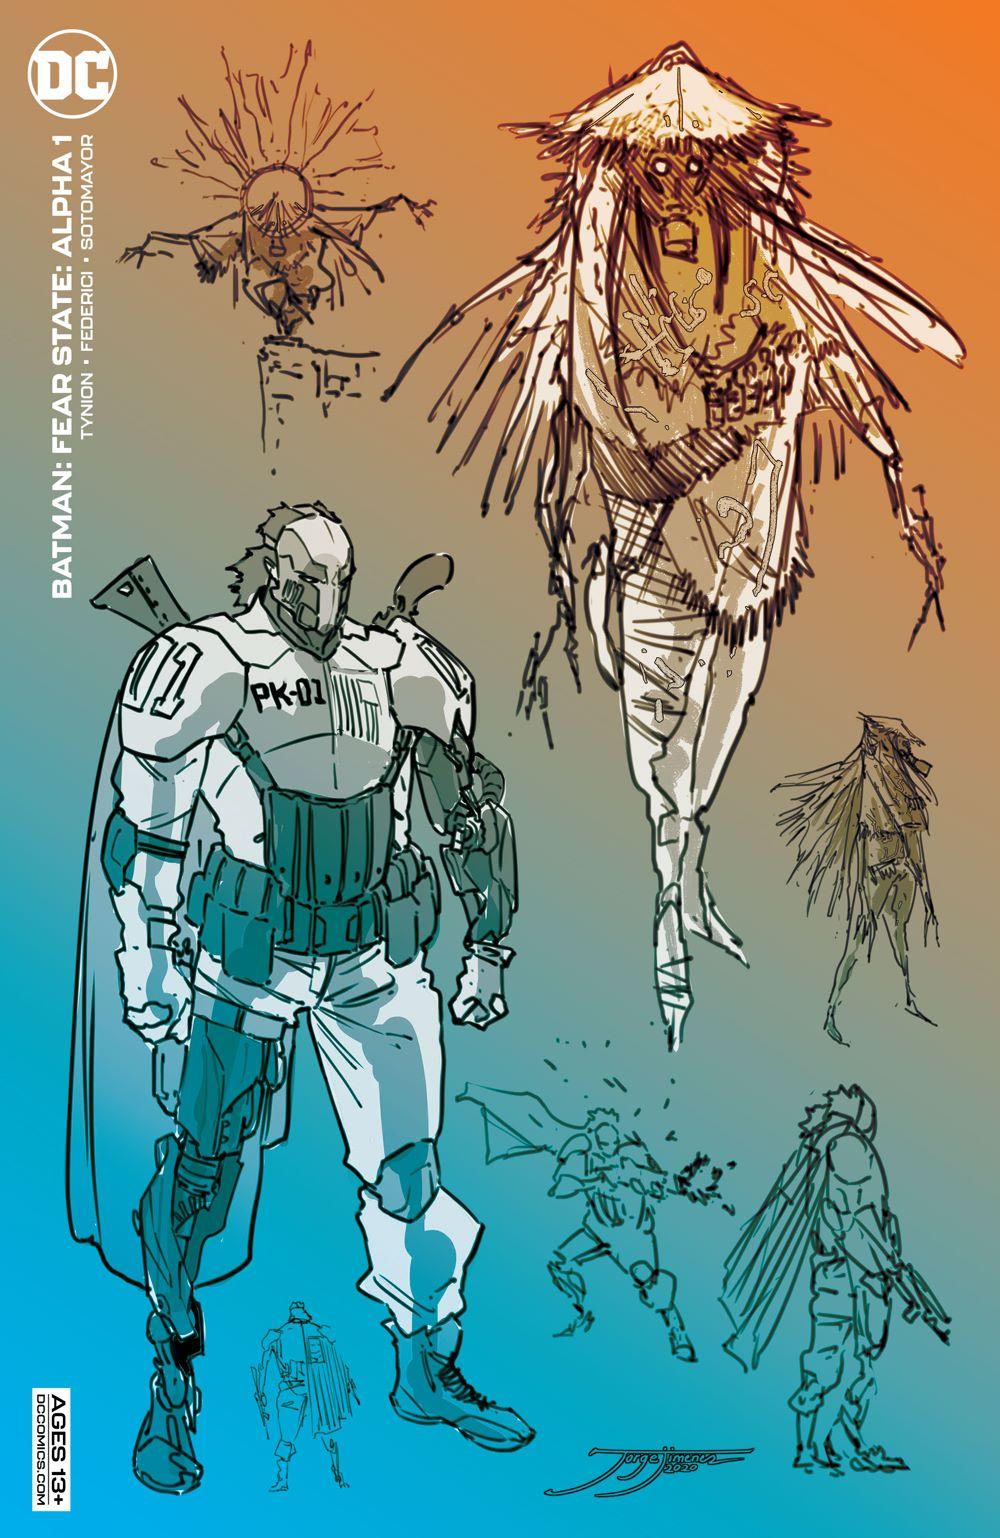 Batman-Fear-State-Alpha-1-3_612851d732cba7.25821018 ComicList Previews: BATMAN FEAR STATE ALPHA #1